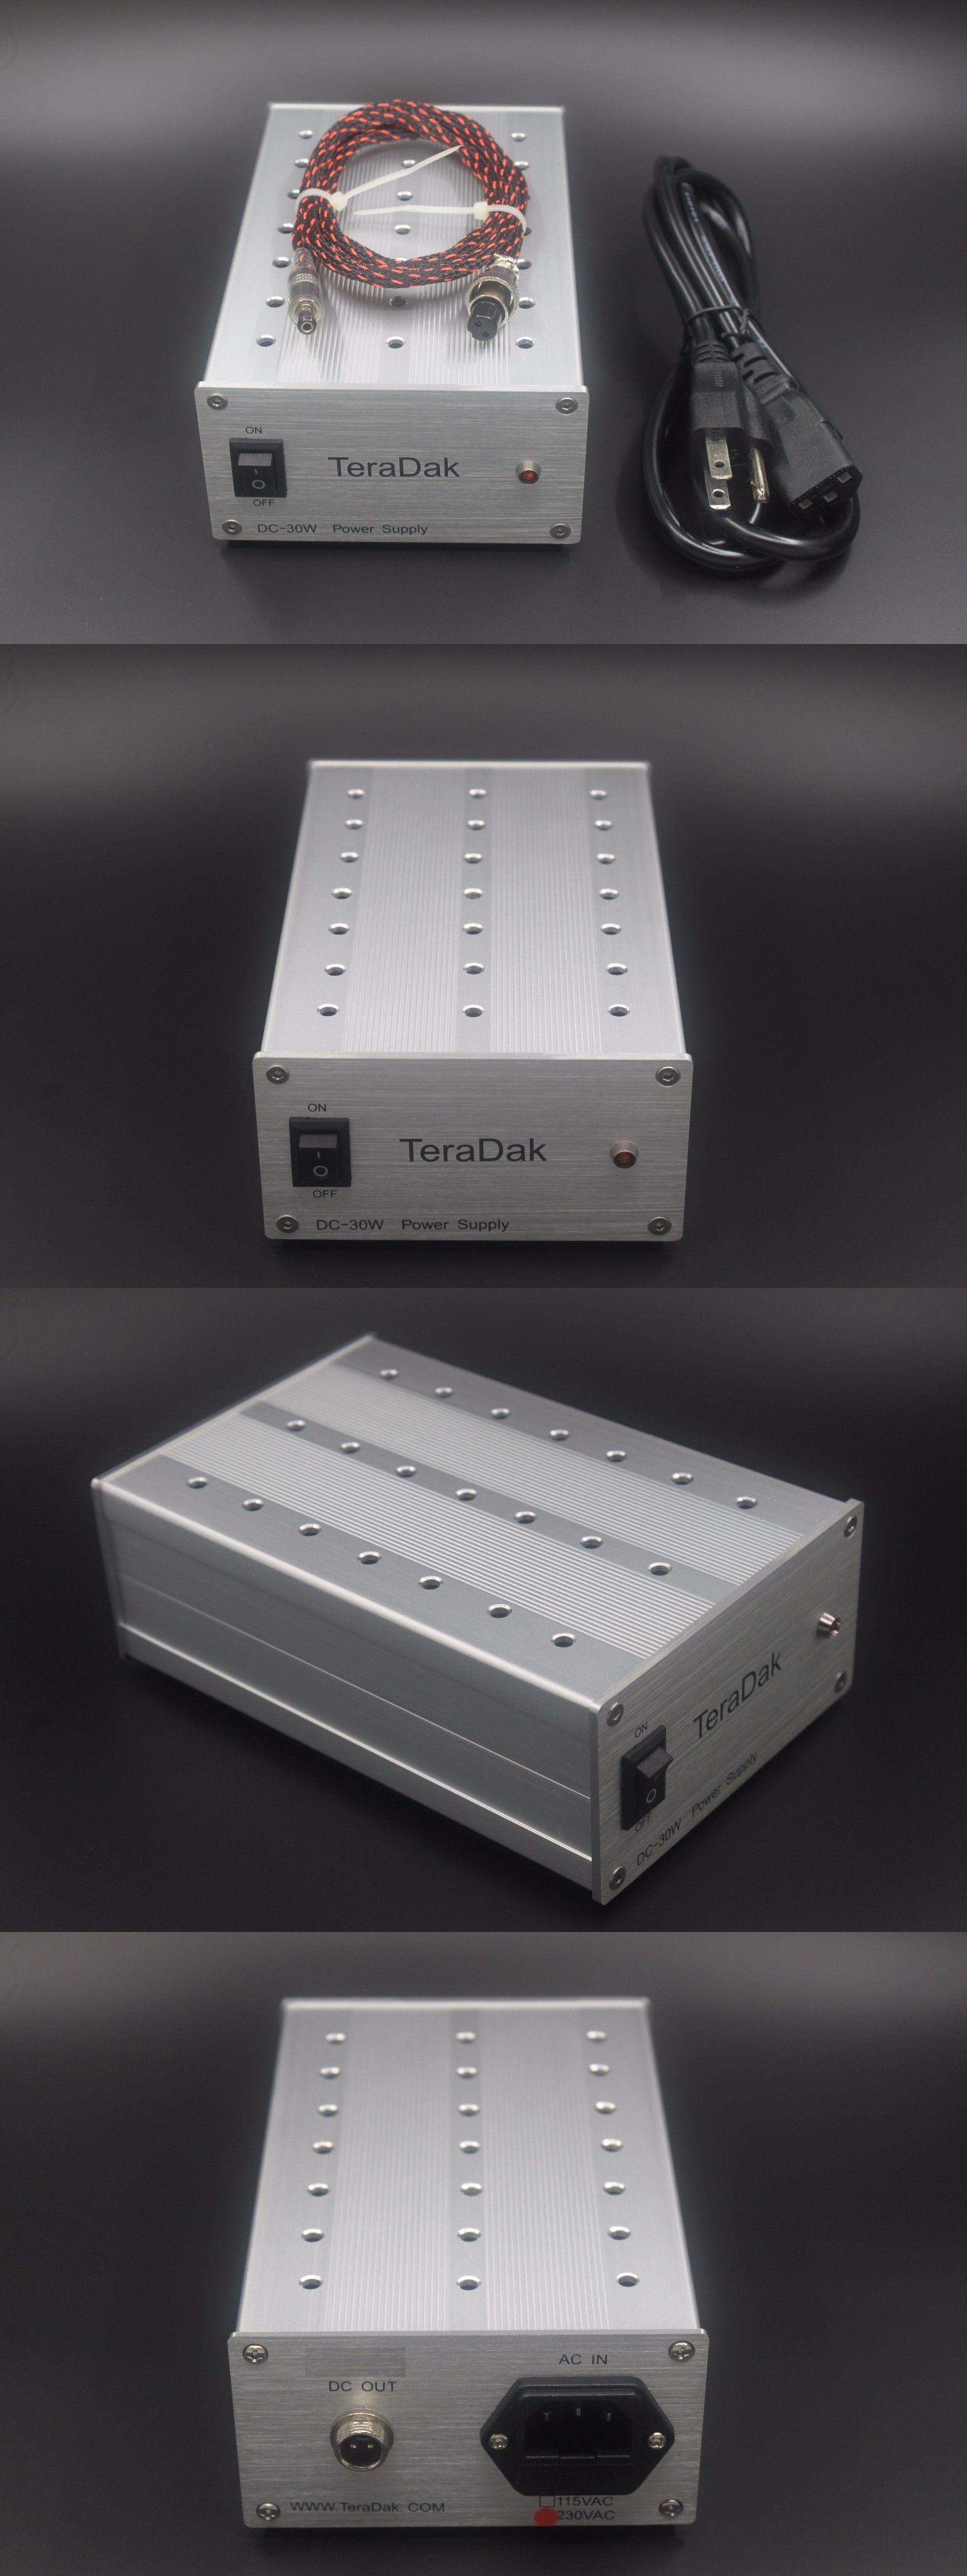 Amplifier Parts And Components 122649 Hot Sale Teradak Dc 30w 12v 2x50w Stereo Class D Audio Power Circuit Board Ebay 15a Fpga